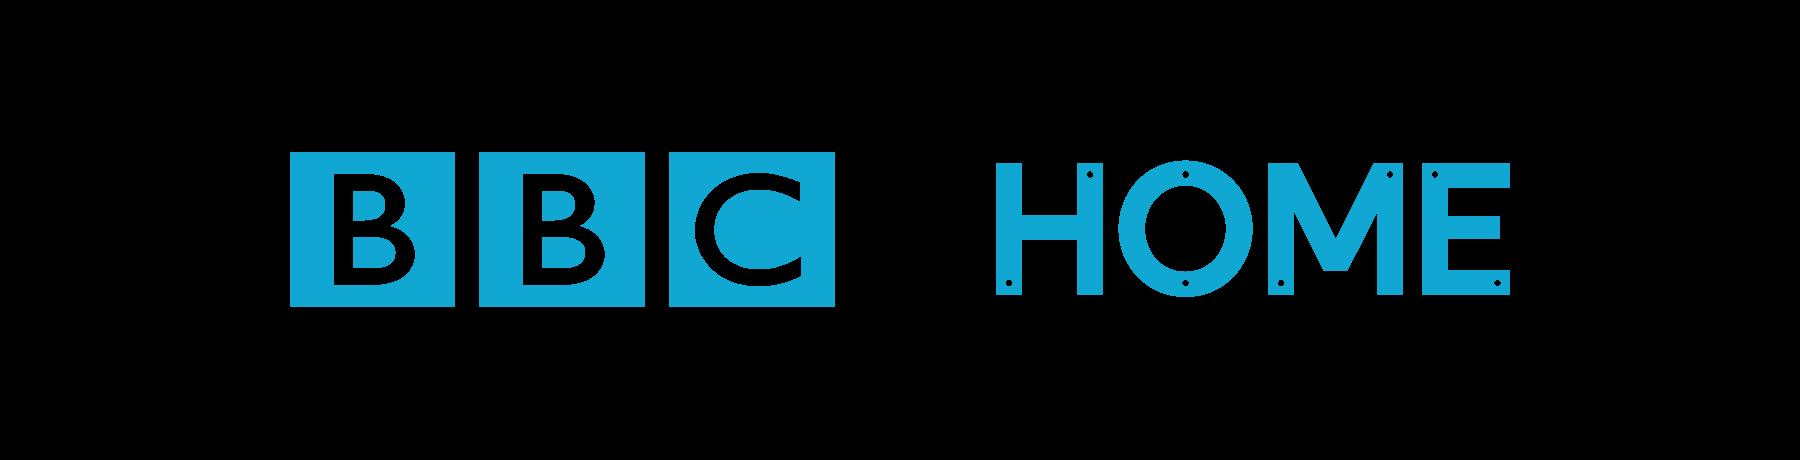 BBC-HOME-1800